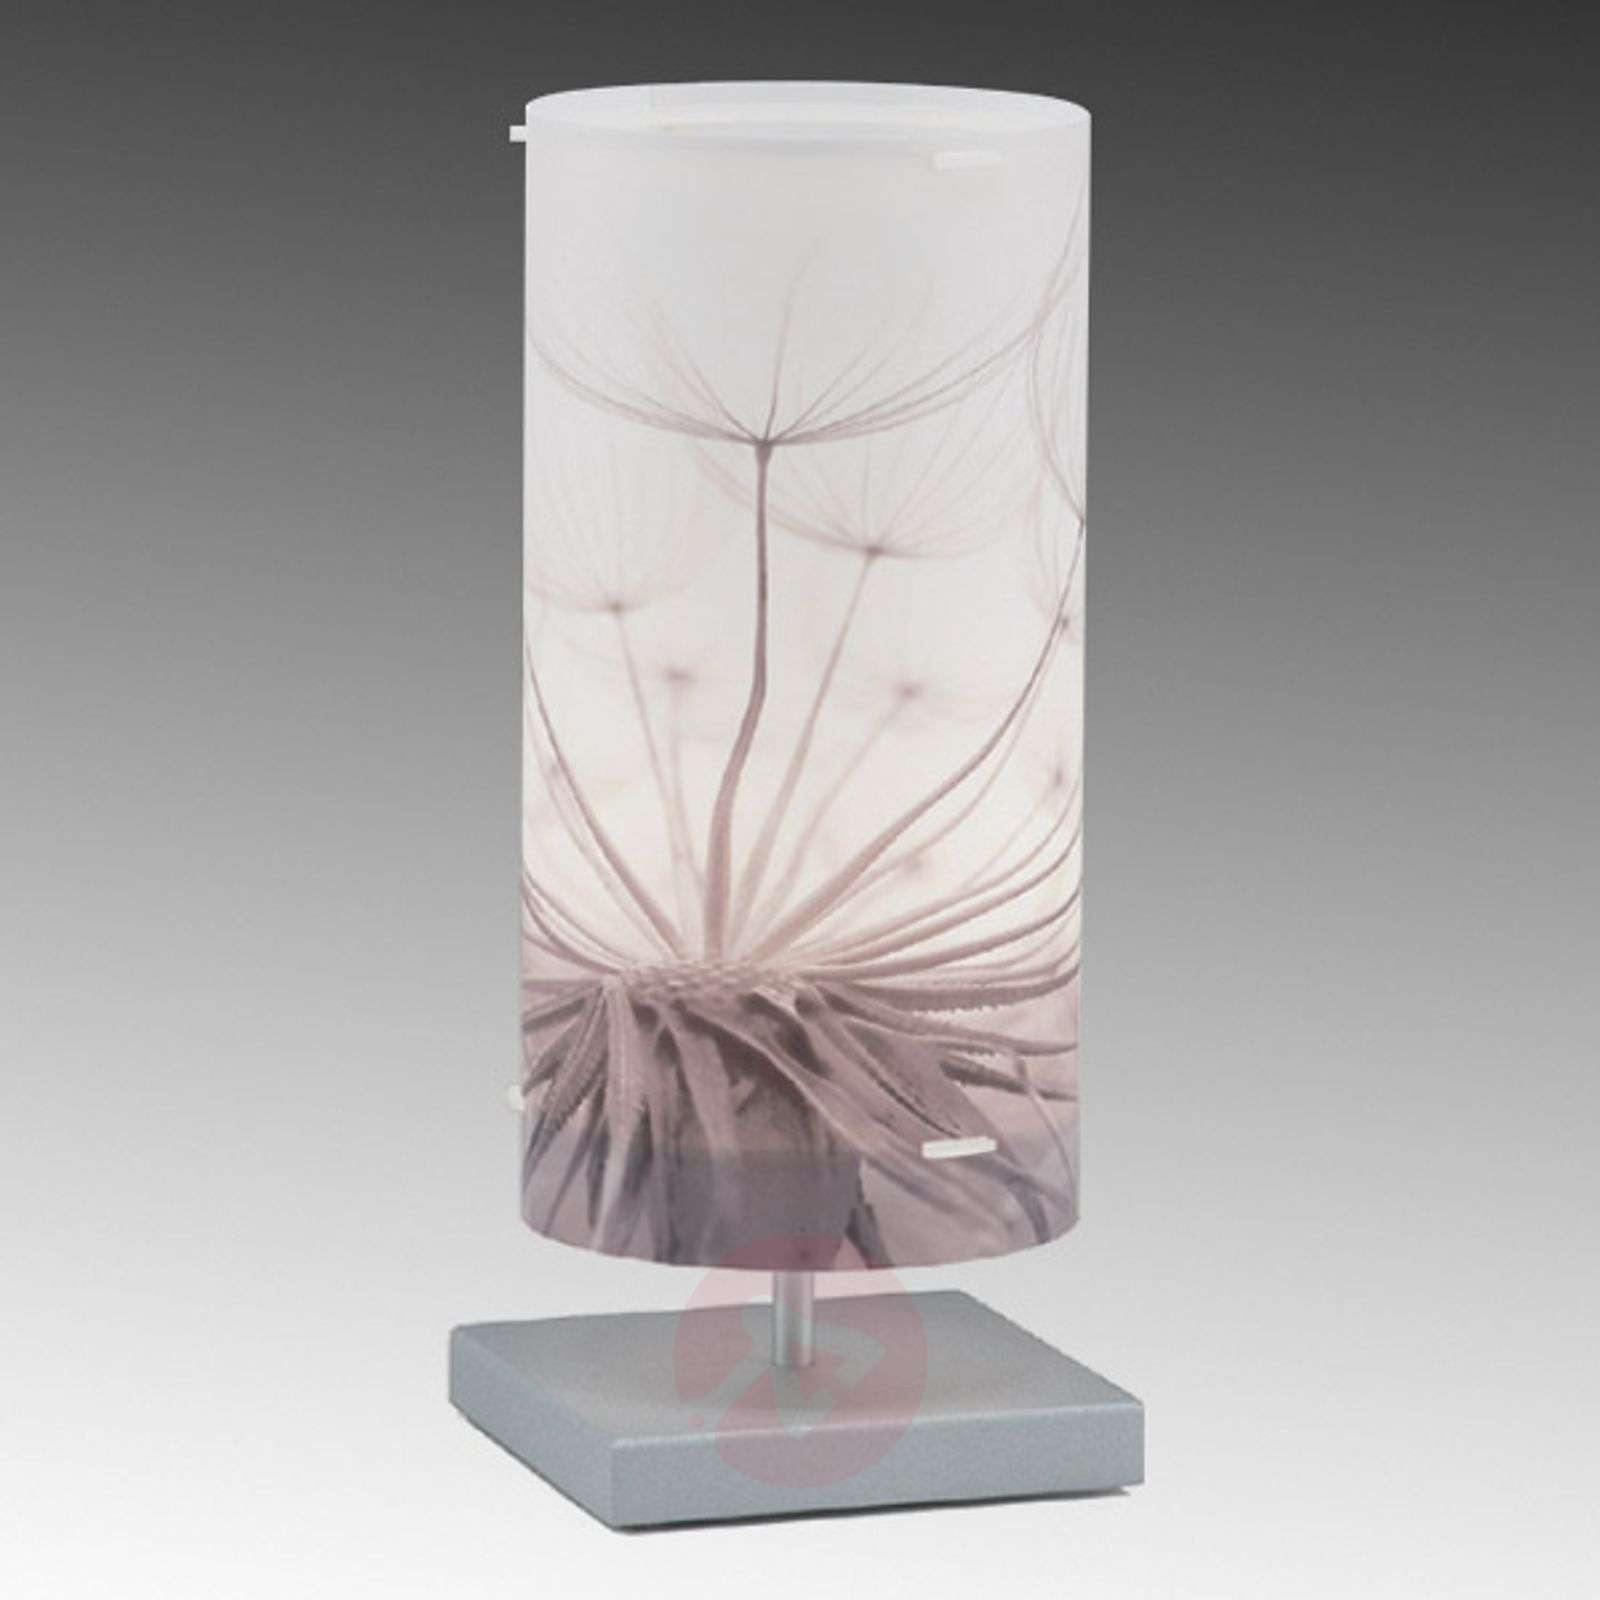 Dandelion table lamp in natural design-1056091-01